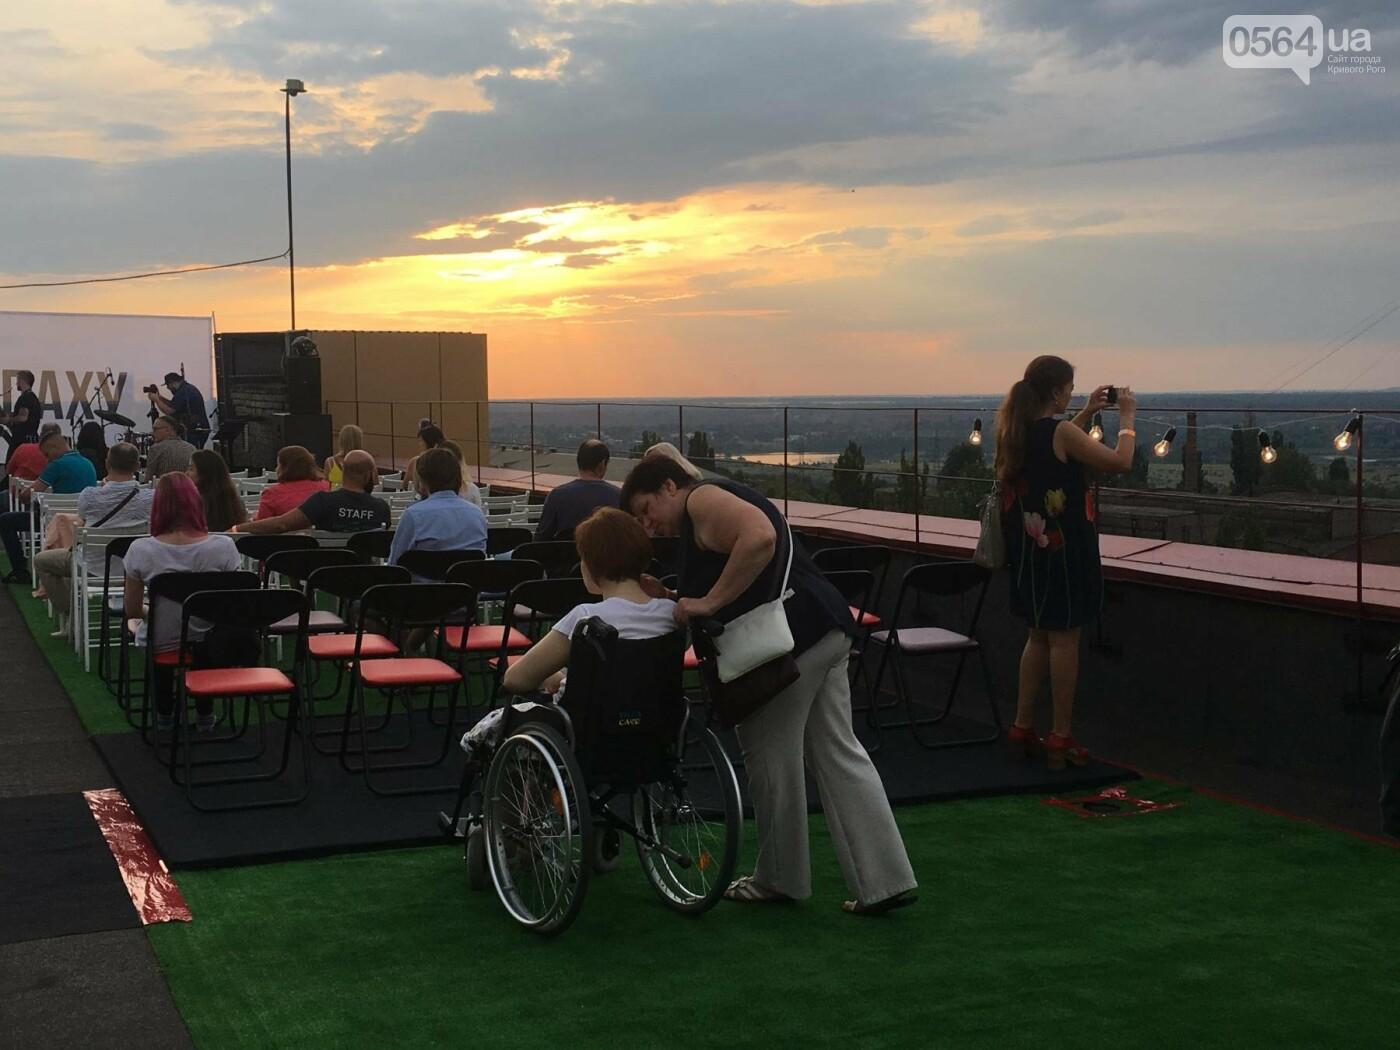 Сотни криворожан встречали закат на крыше отеля под мелодии джаза, - ФОТО, ВИДЕО, фото-25